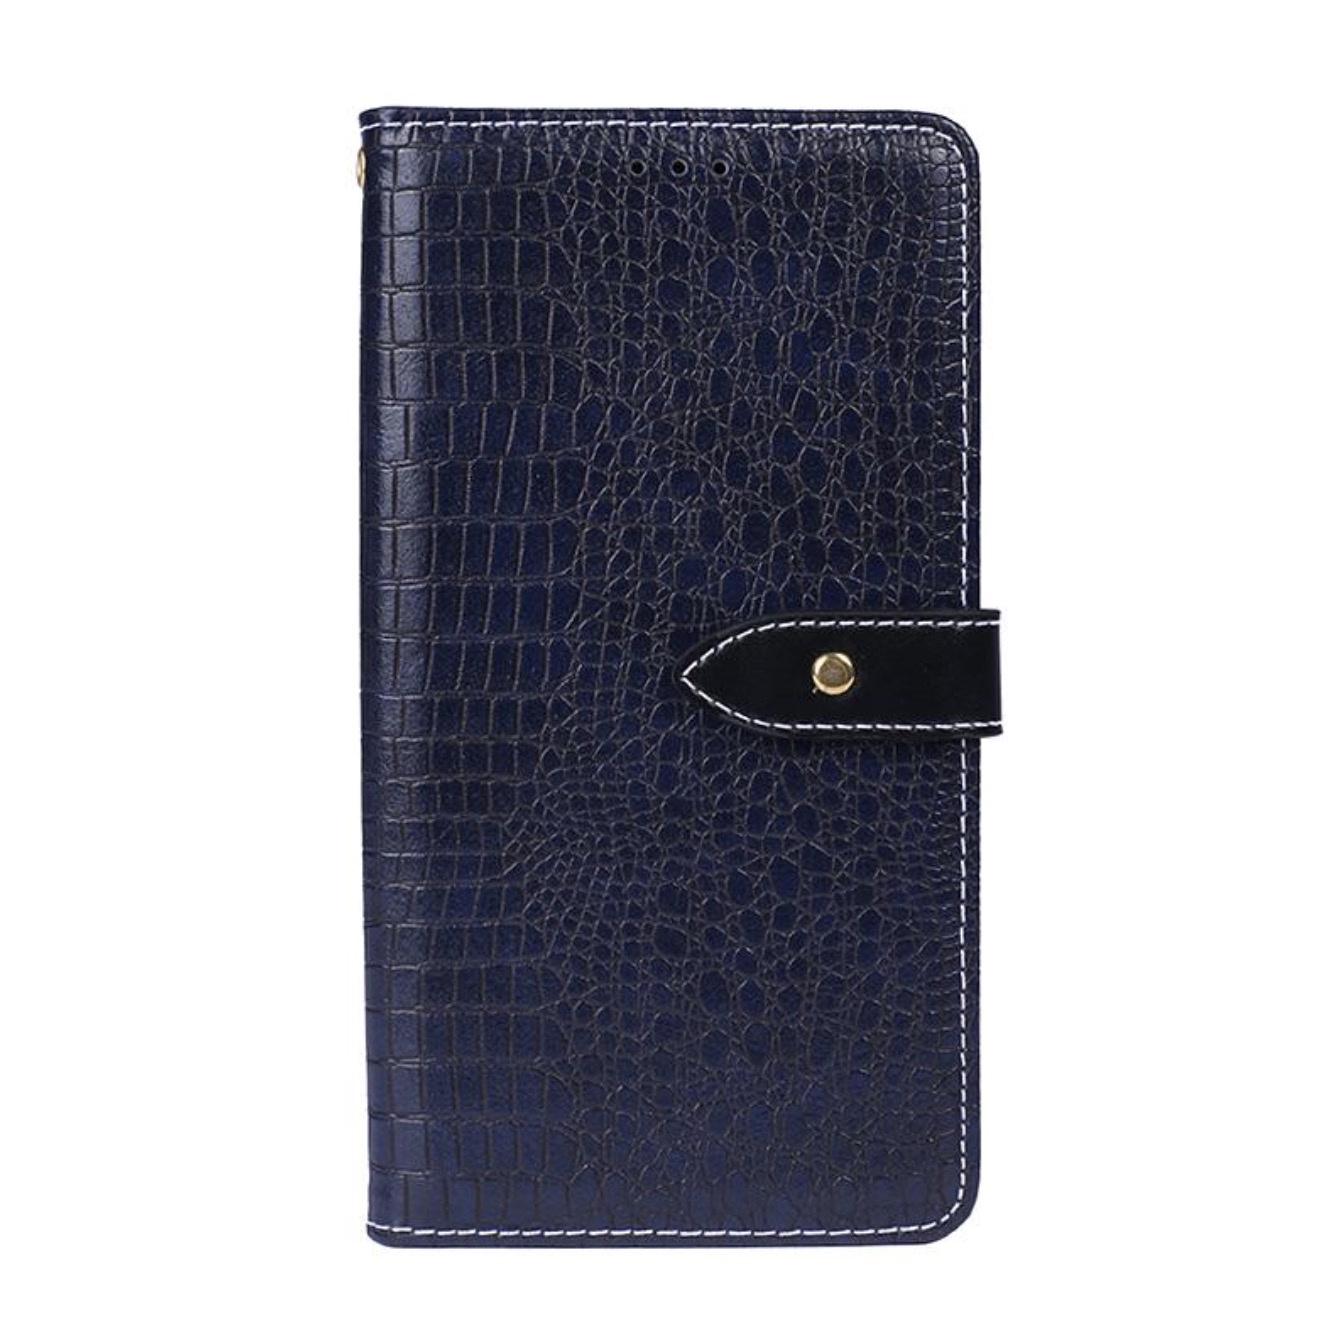 Чехол-книжка MyPads для Huawei Honor 8A/Huawei Y6 (2019)/ Honor 8A Pro/ Y6 Prime 2019 с фактурной прошивкой рельефа кожи крокодила с застежкой и визитницей синий